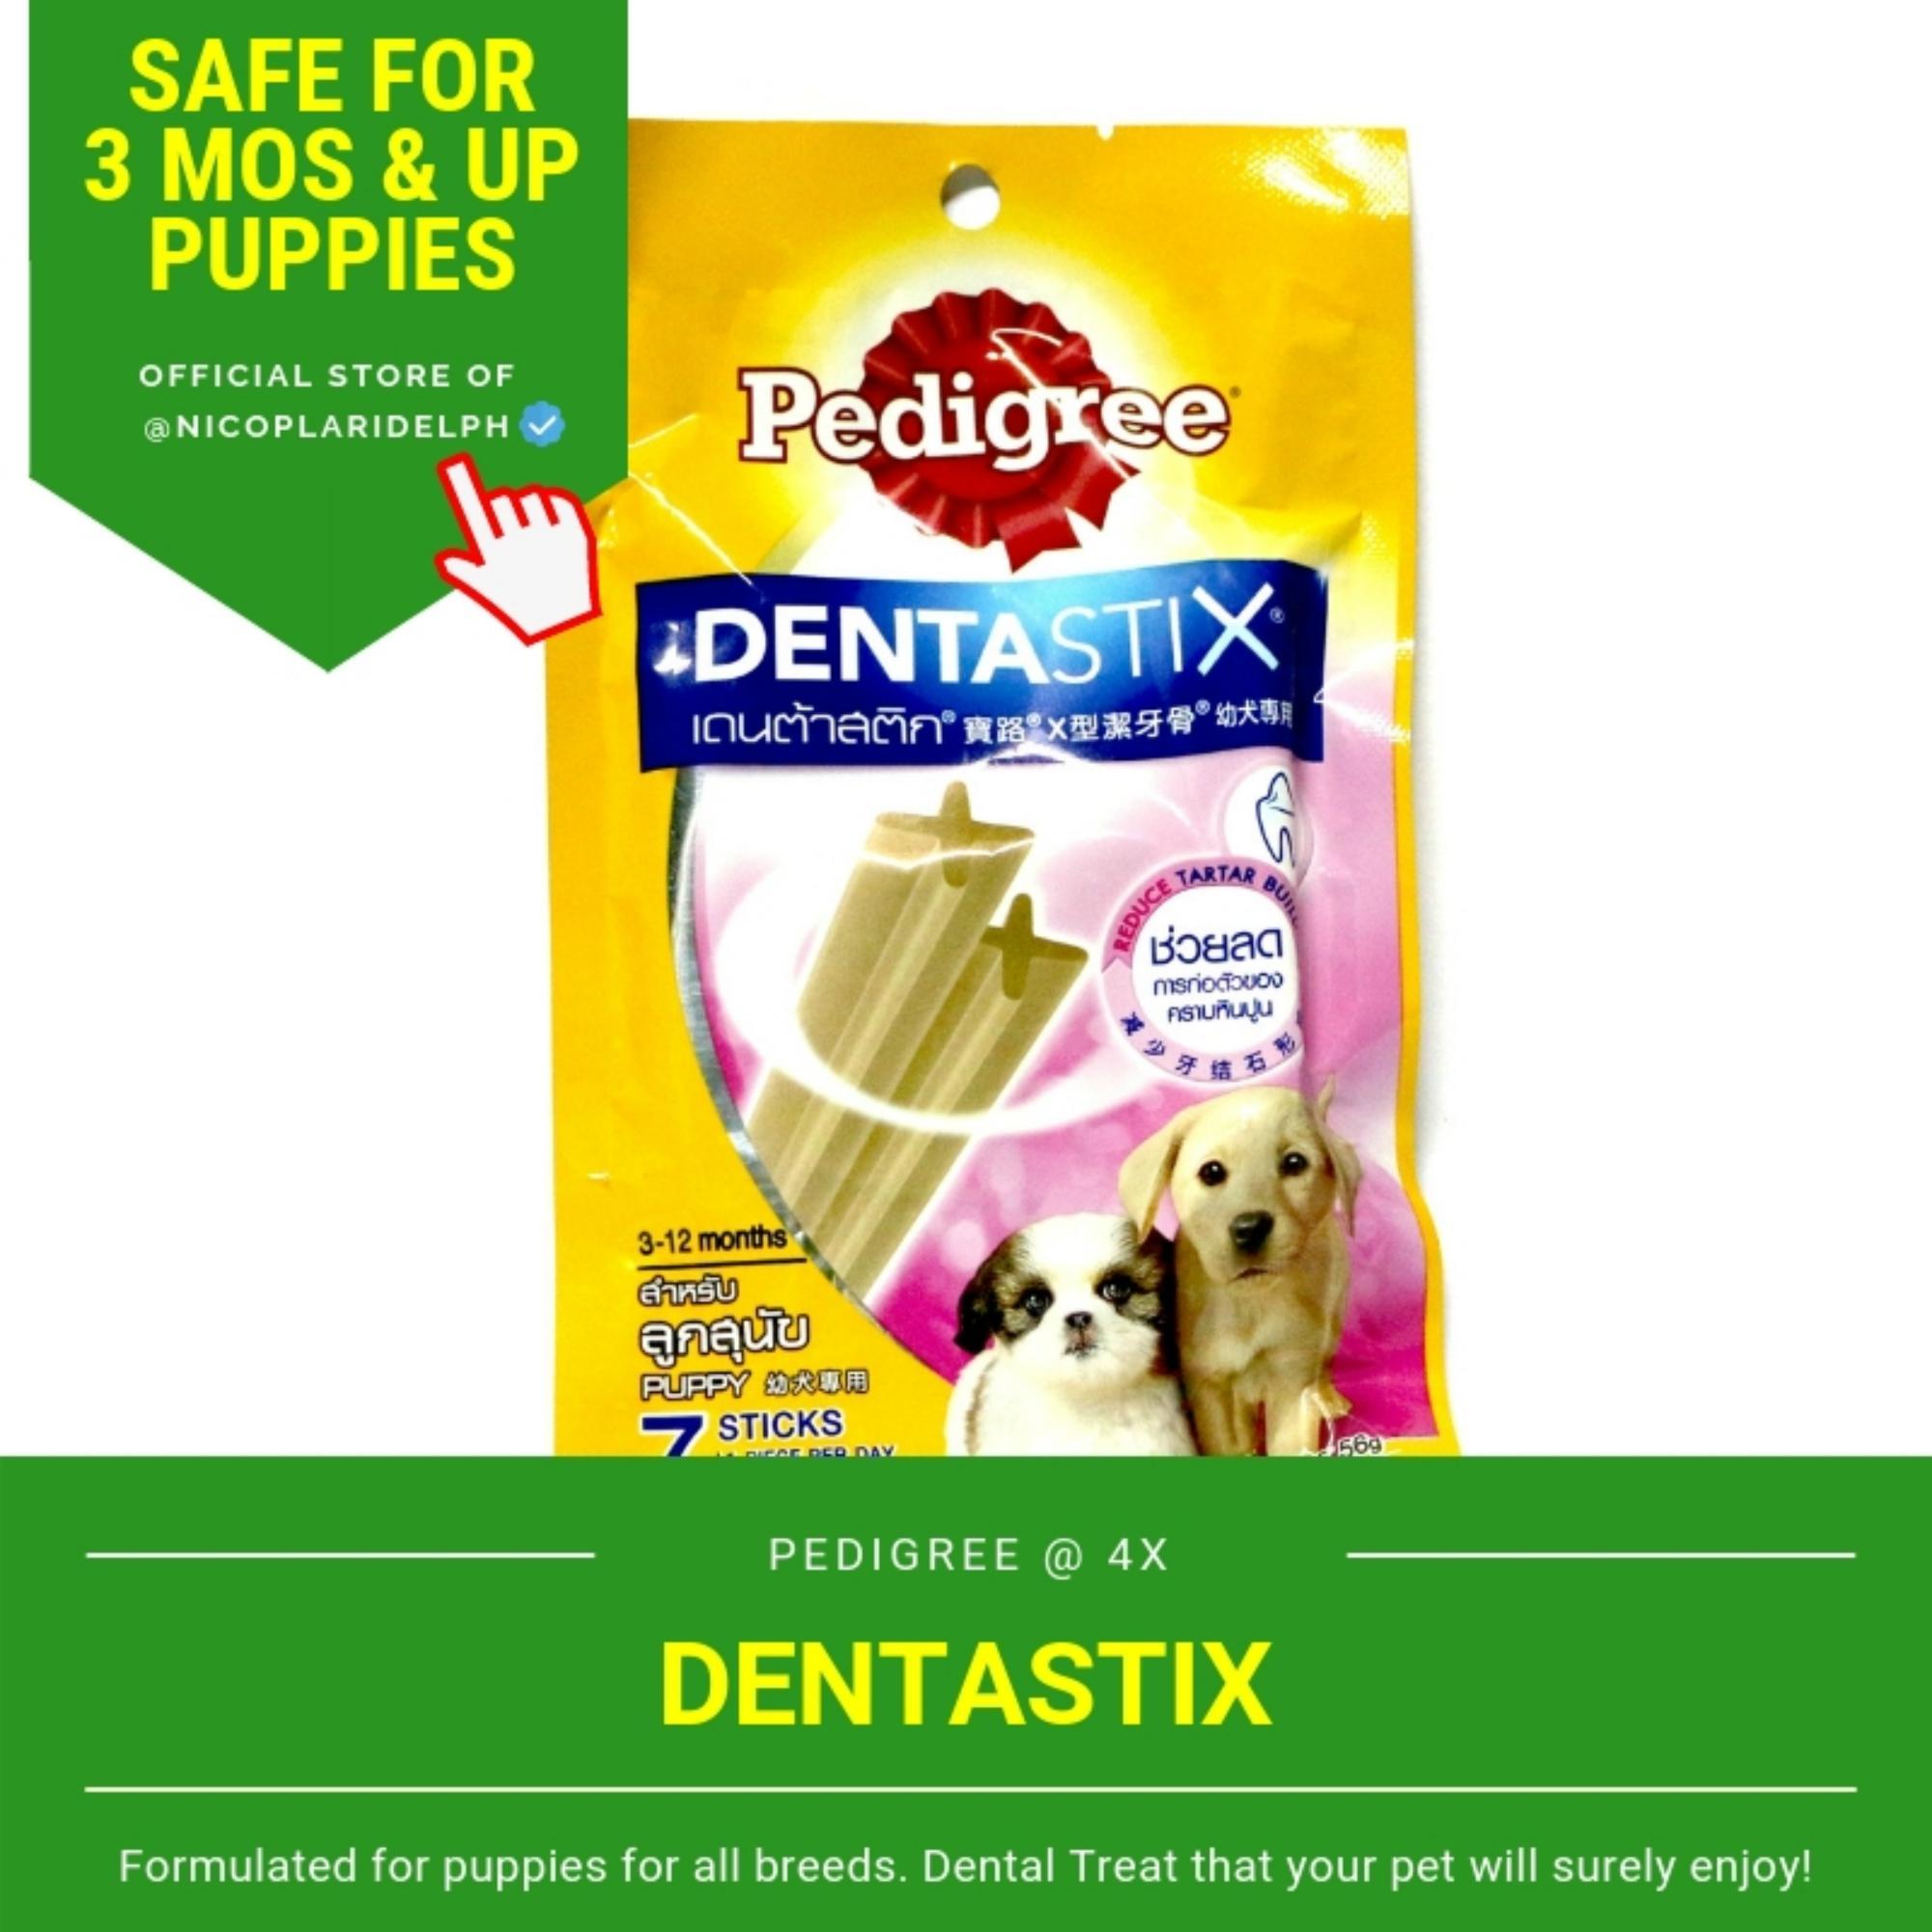 Pedigree Dentastix Original Flavor For Puppies (56g) By Nicoplaridelph.